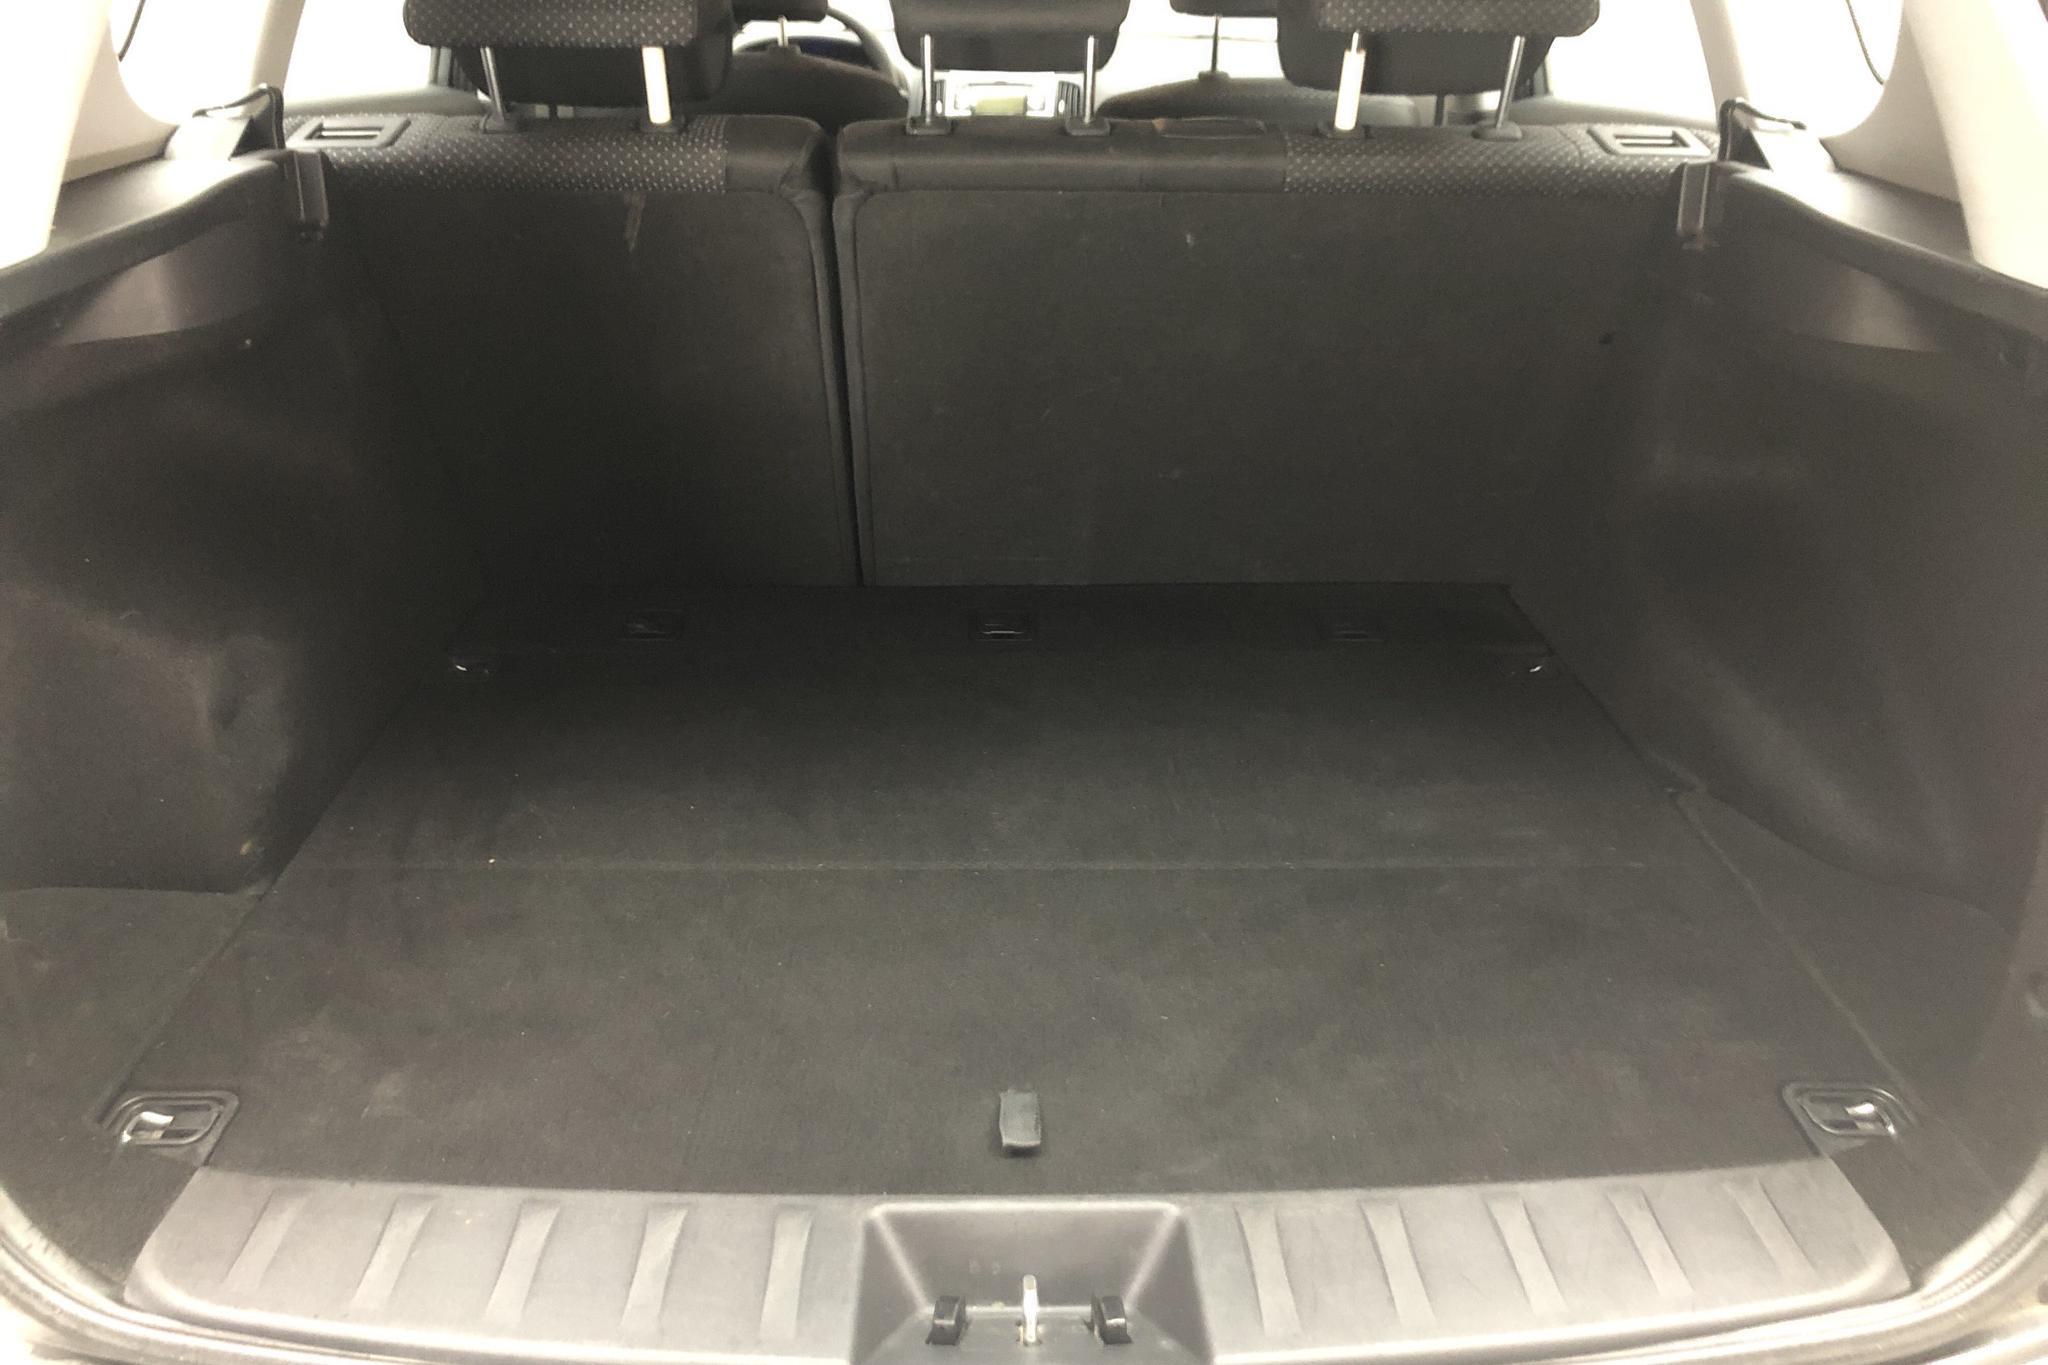 Hyundai i30 1.6 CRDi Kombi (90hk) - 161 230 km - Manual - gray - 2011